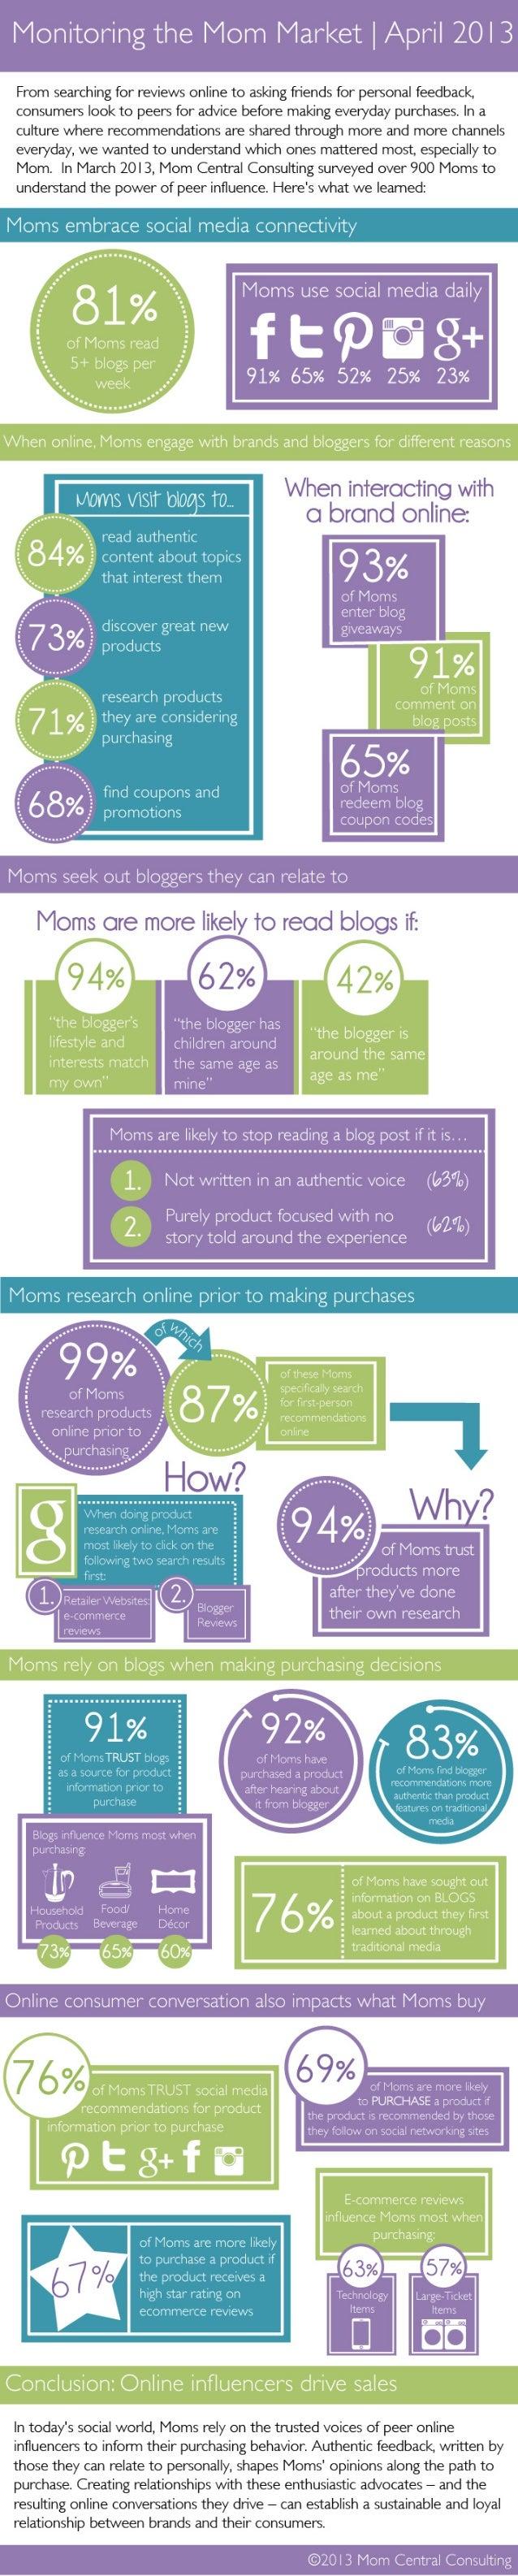 How Online Conversations Impact Retail Conversions